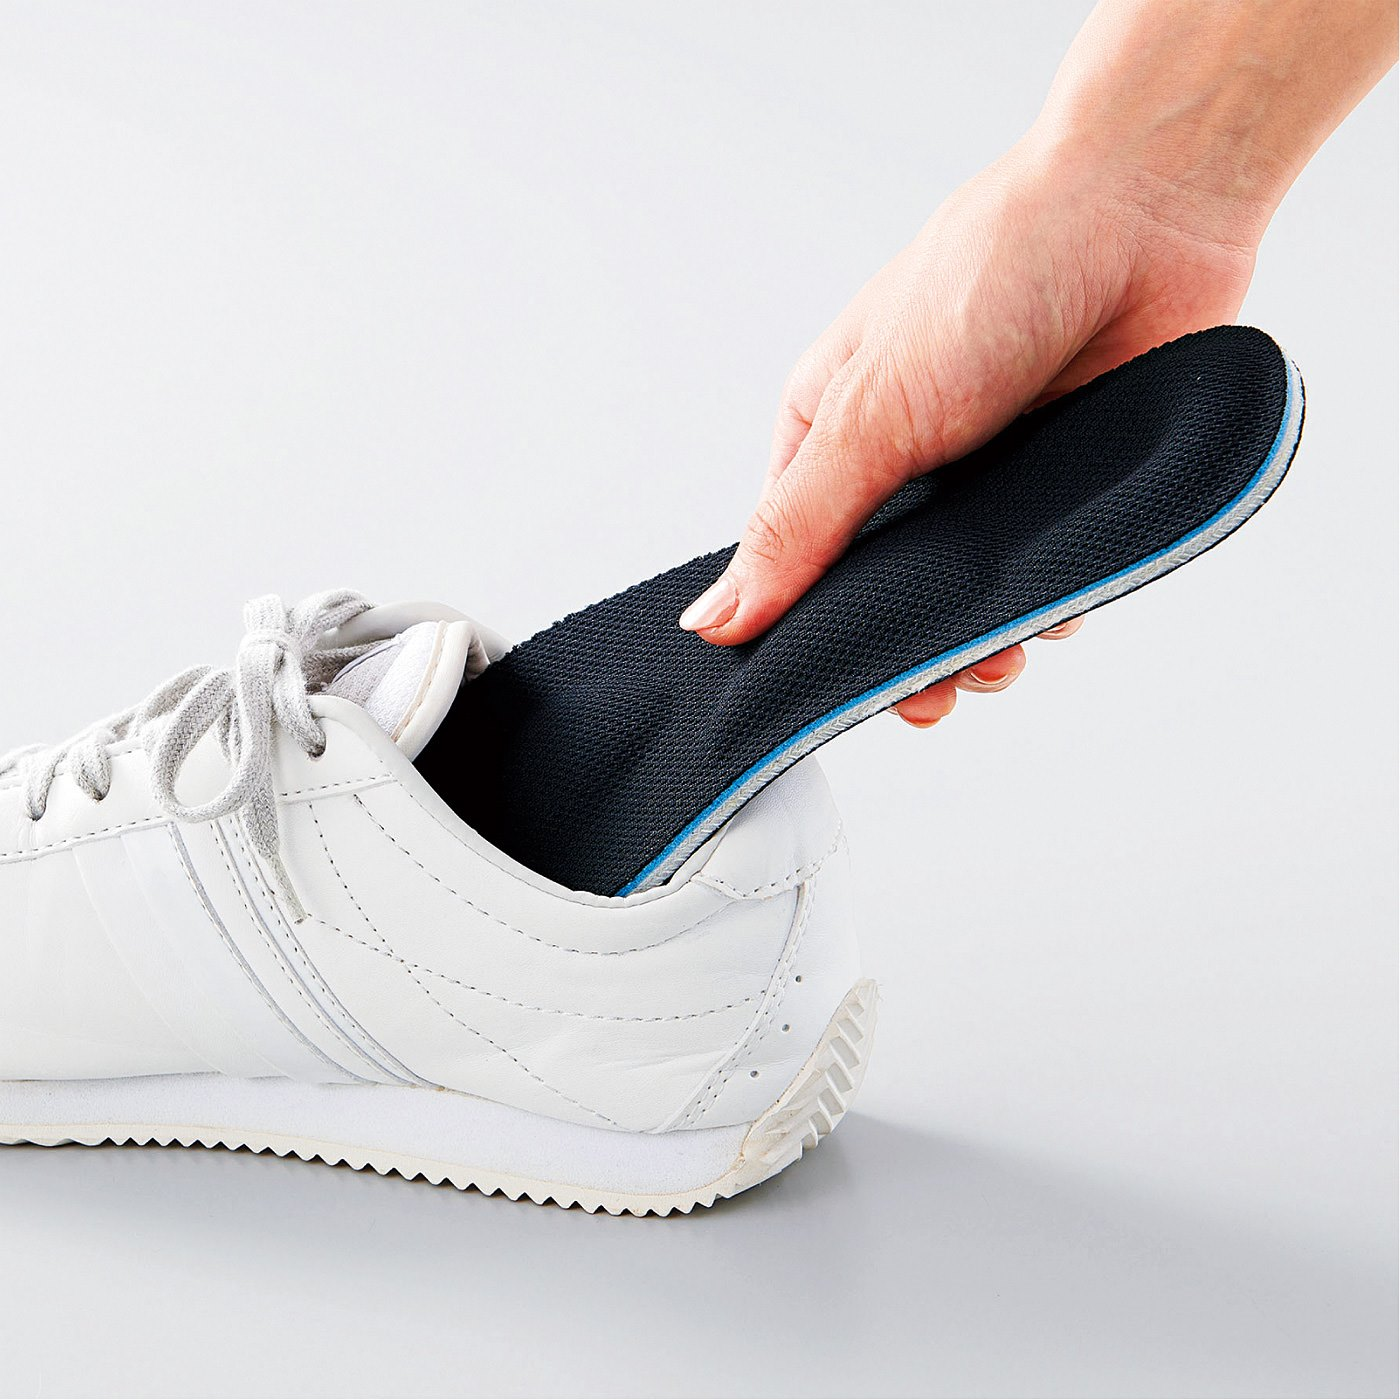 Kraso[クラソ]  くぎやガラス片から足裏を守る 踏み抜き防止インソール足まもりーな〈22.5~23.5cm〉 ふつうのインソールと同じように、靴の中に敷くだけ。